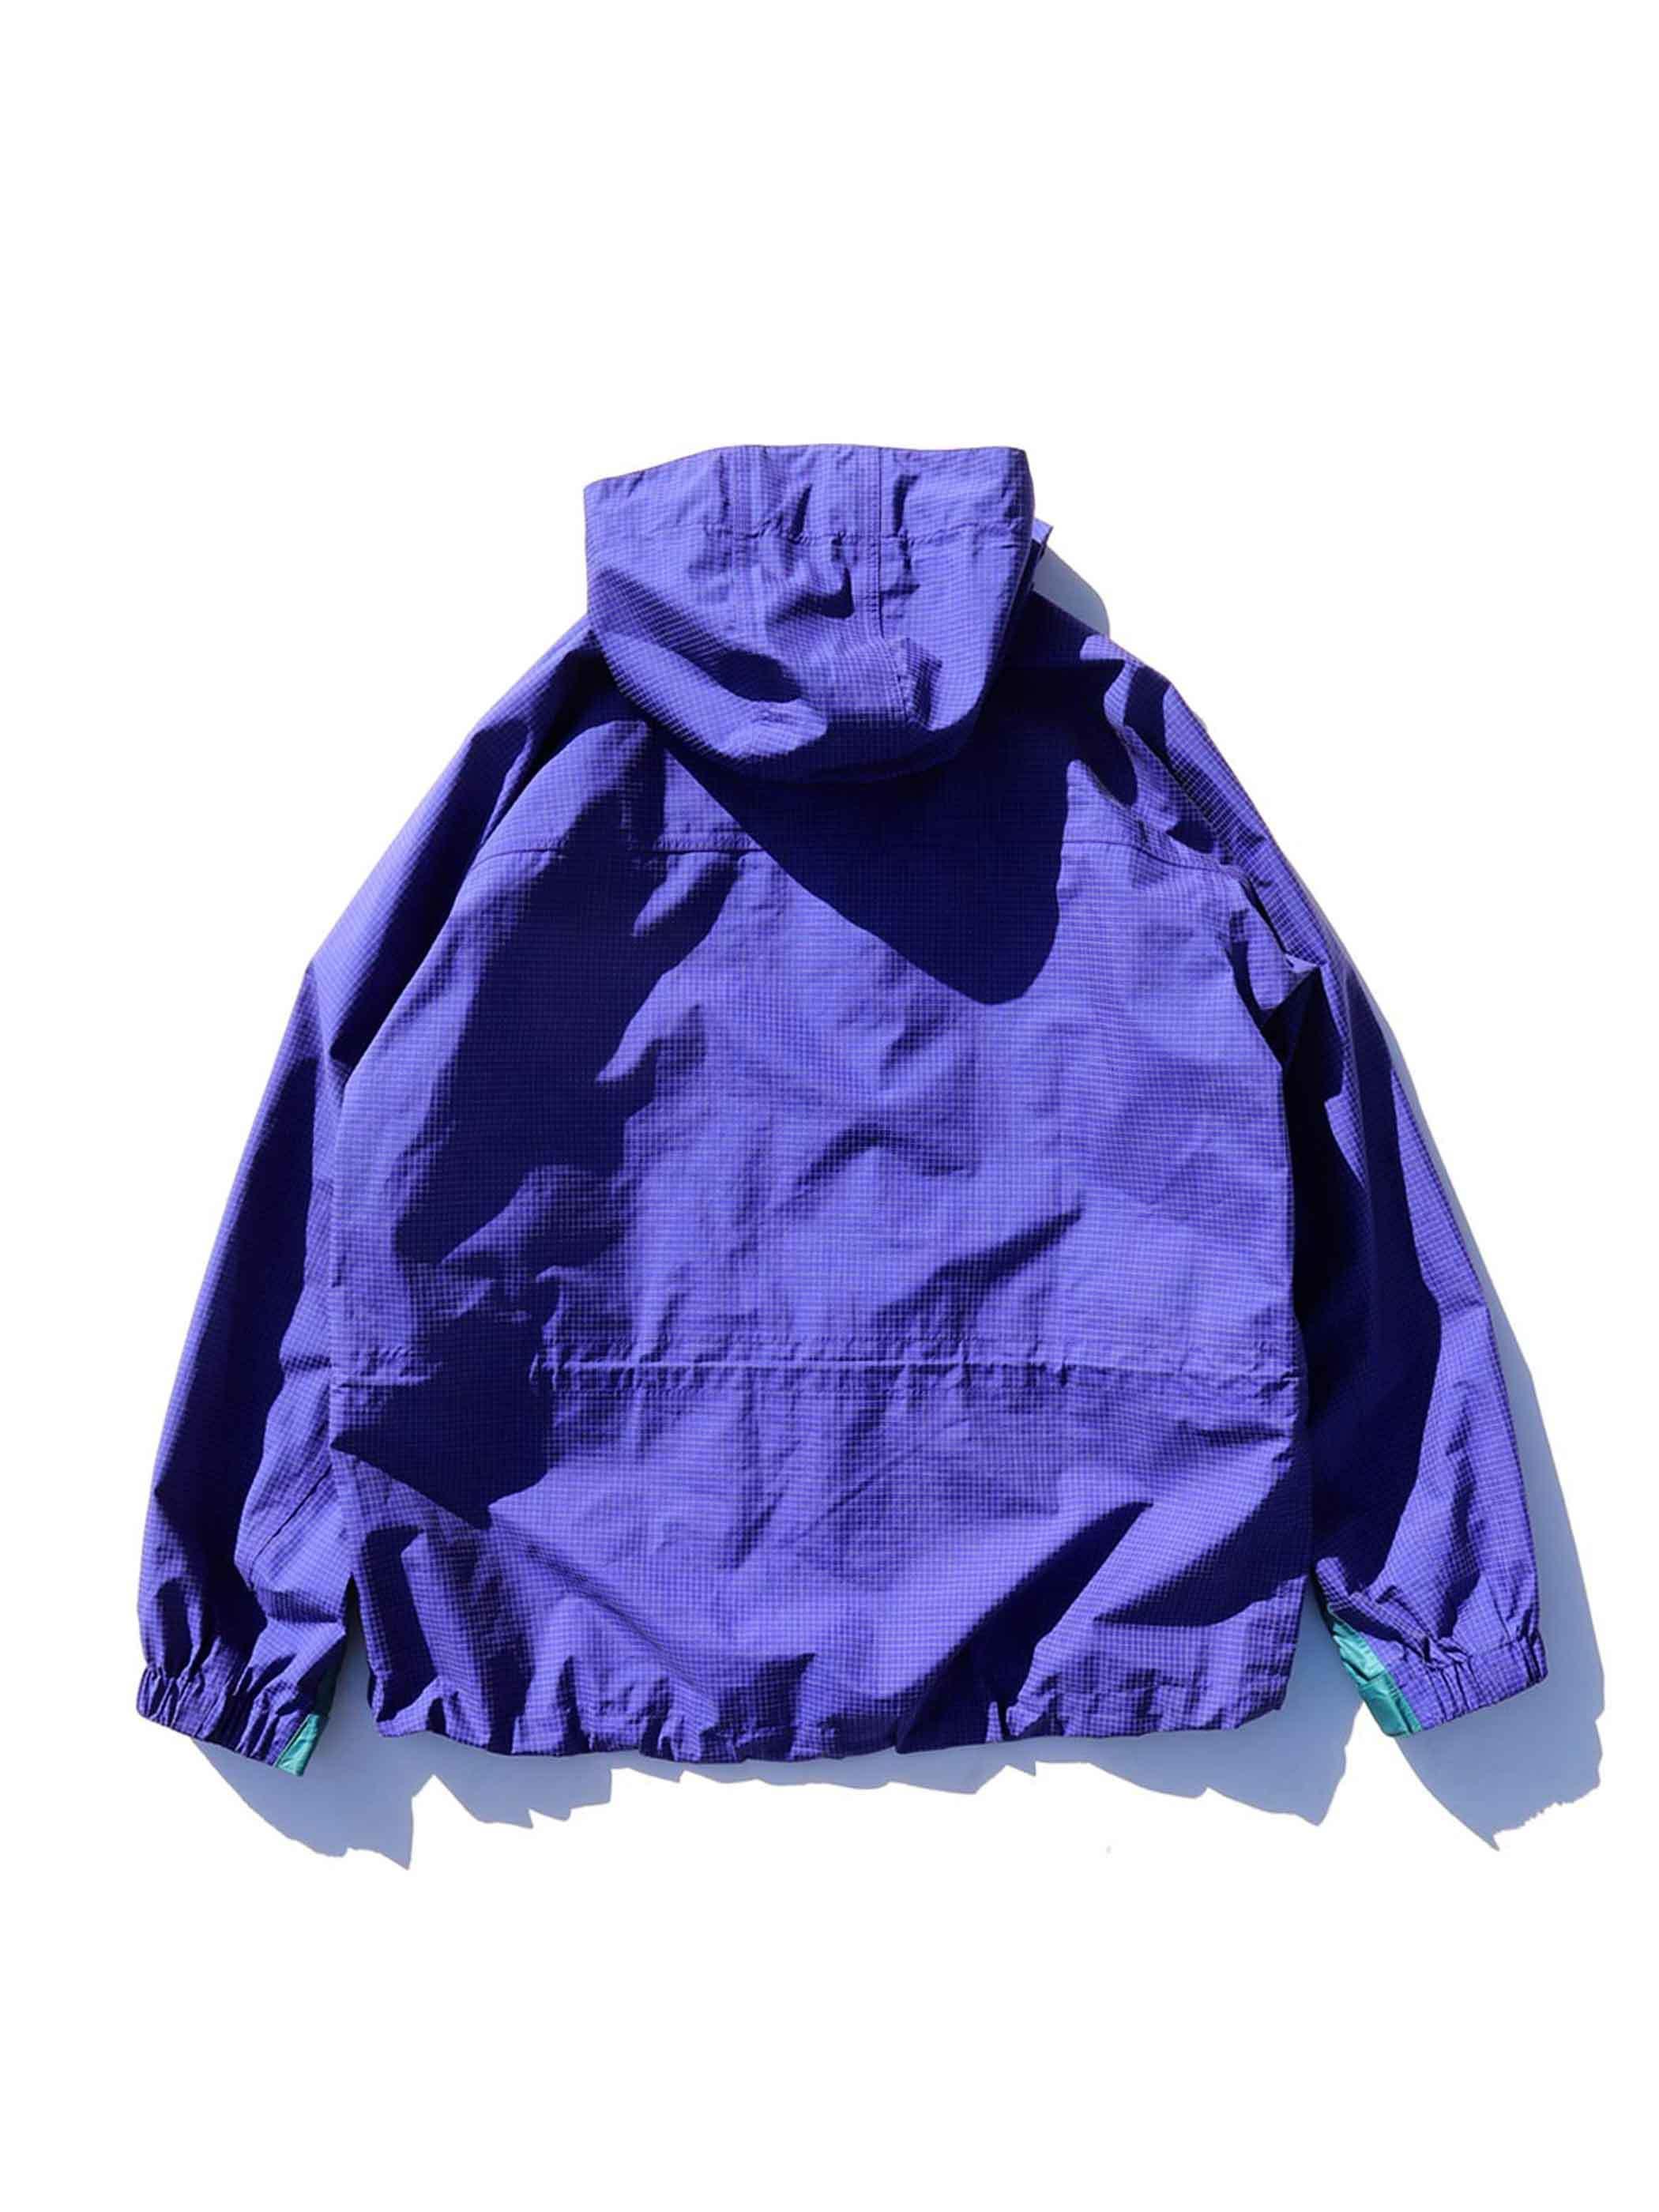 90's PATAGONIA Cobalt×Teal Super Alpine Jacket [About L]